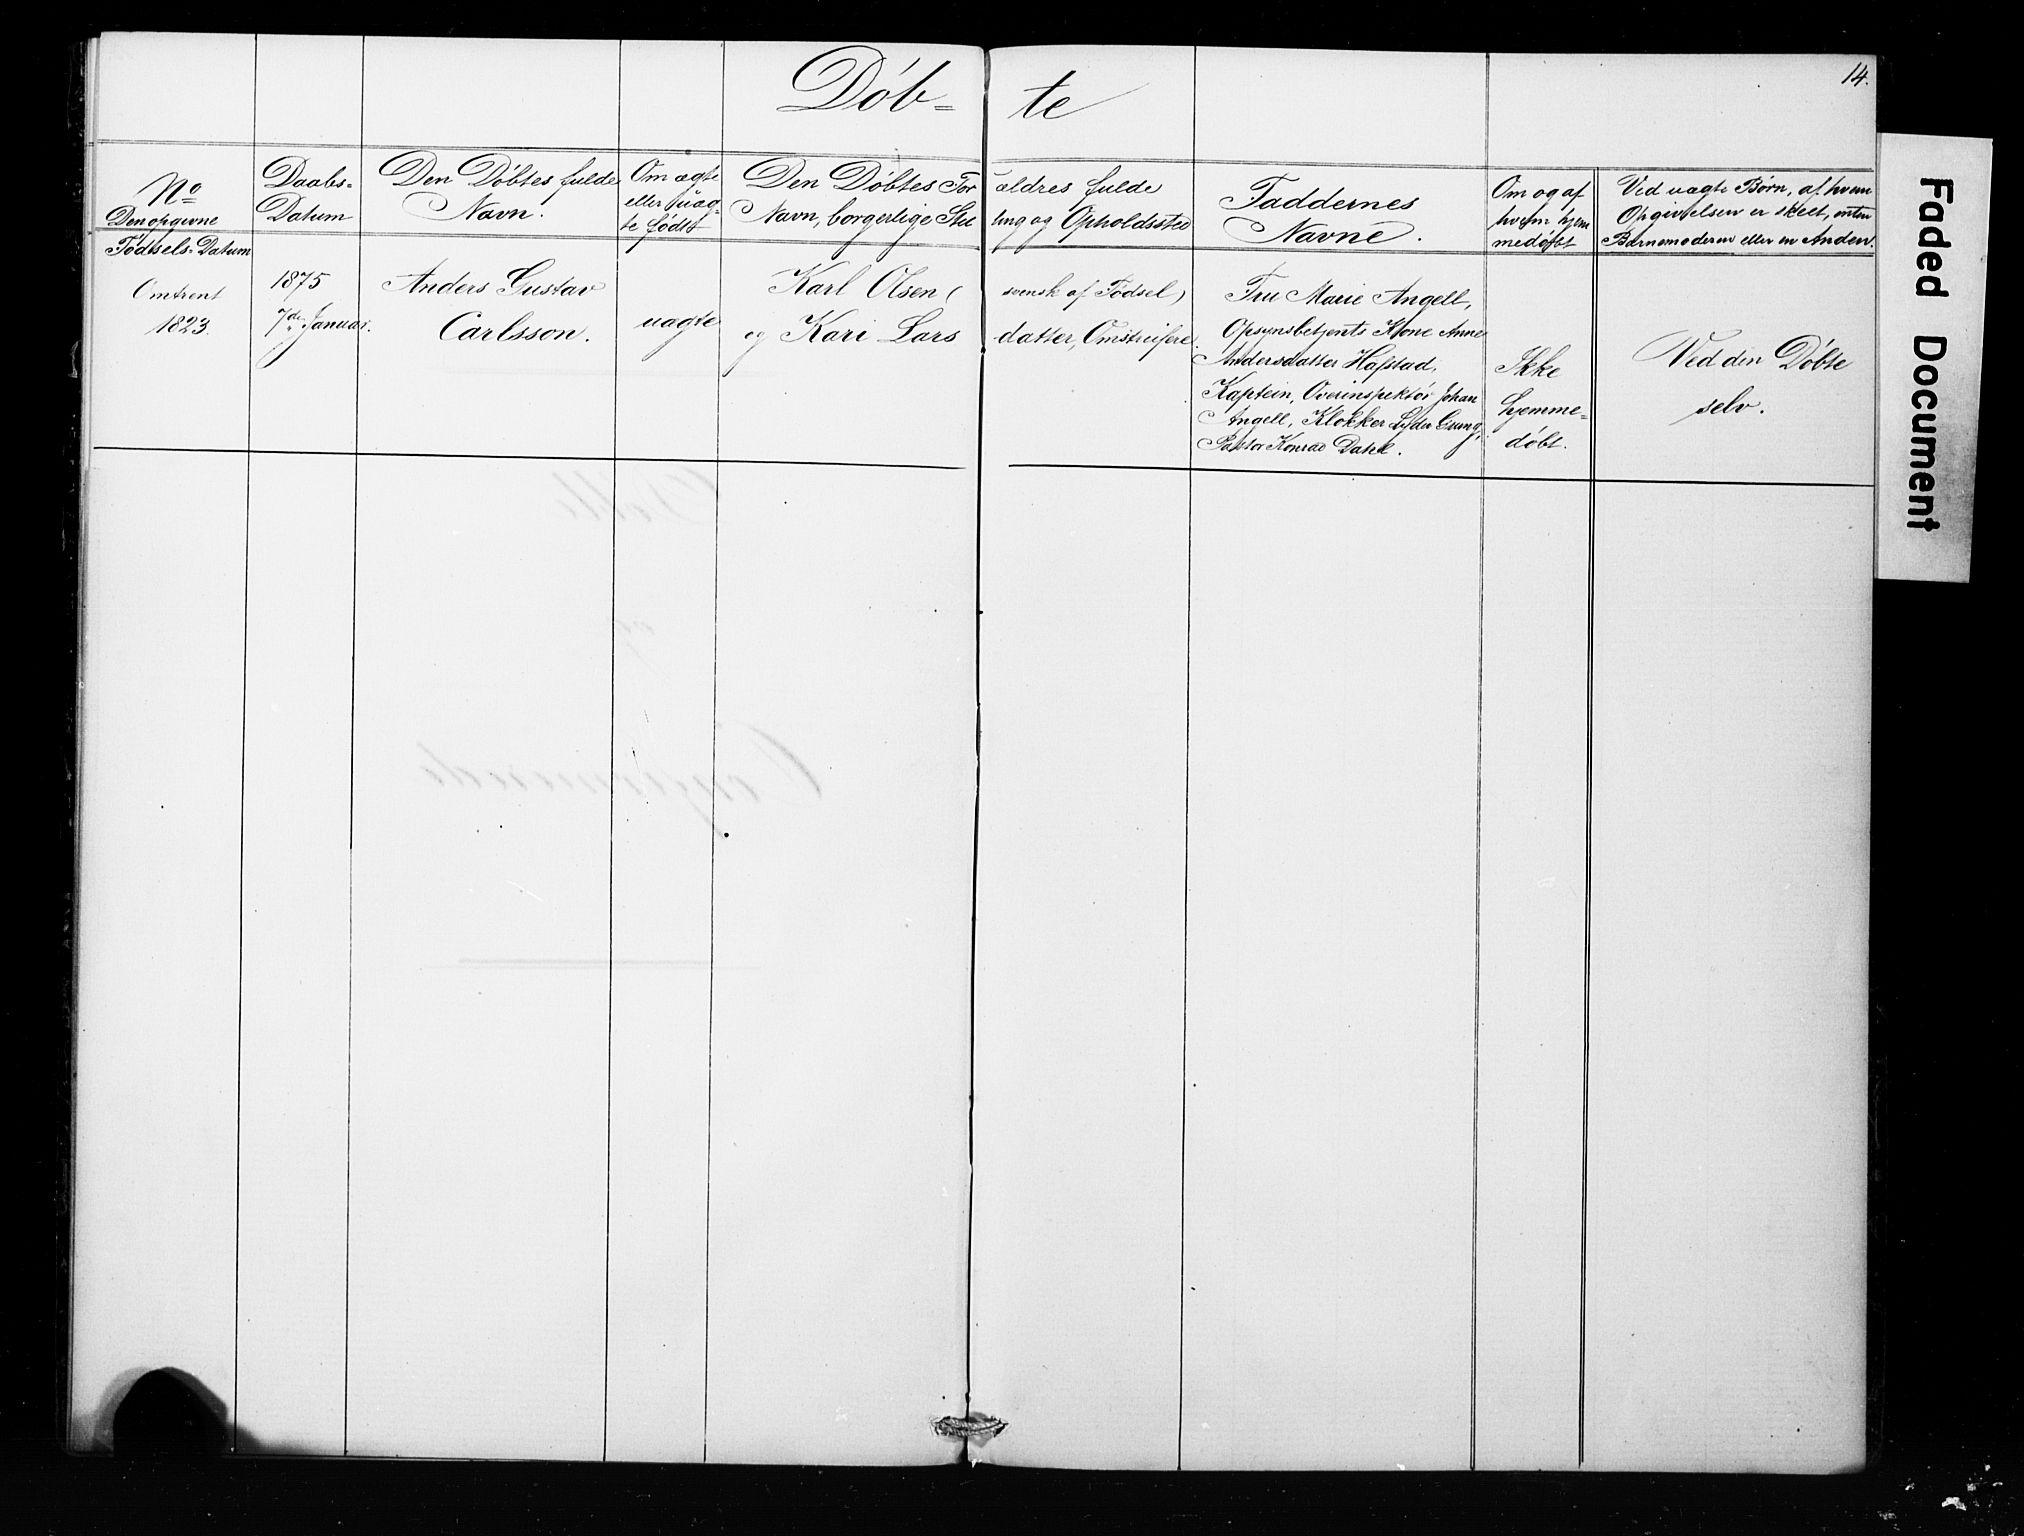 SAB, Bergens strafanstalts sokneprestembete*, Klokkerbok nr. A 1, 1874-1884, s. 14